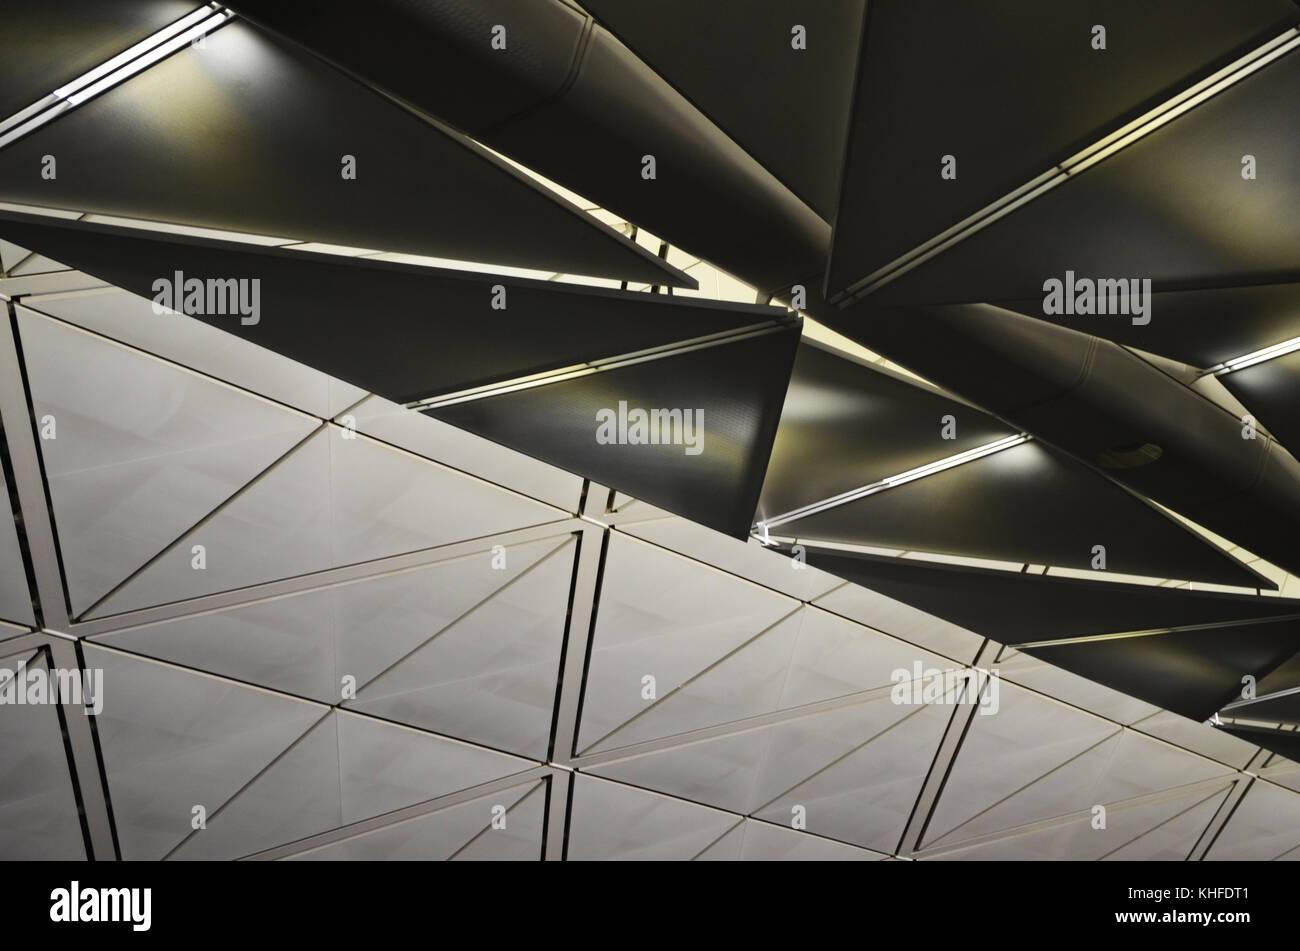 Metal Screen Architecture Stock Photos Amp Metal Screen